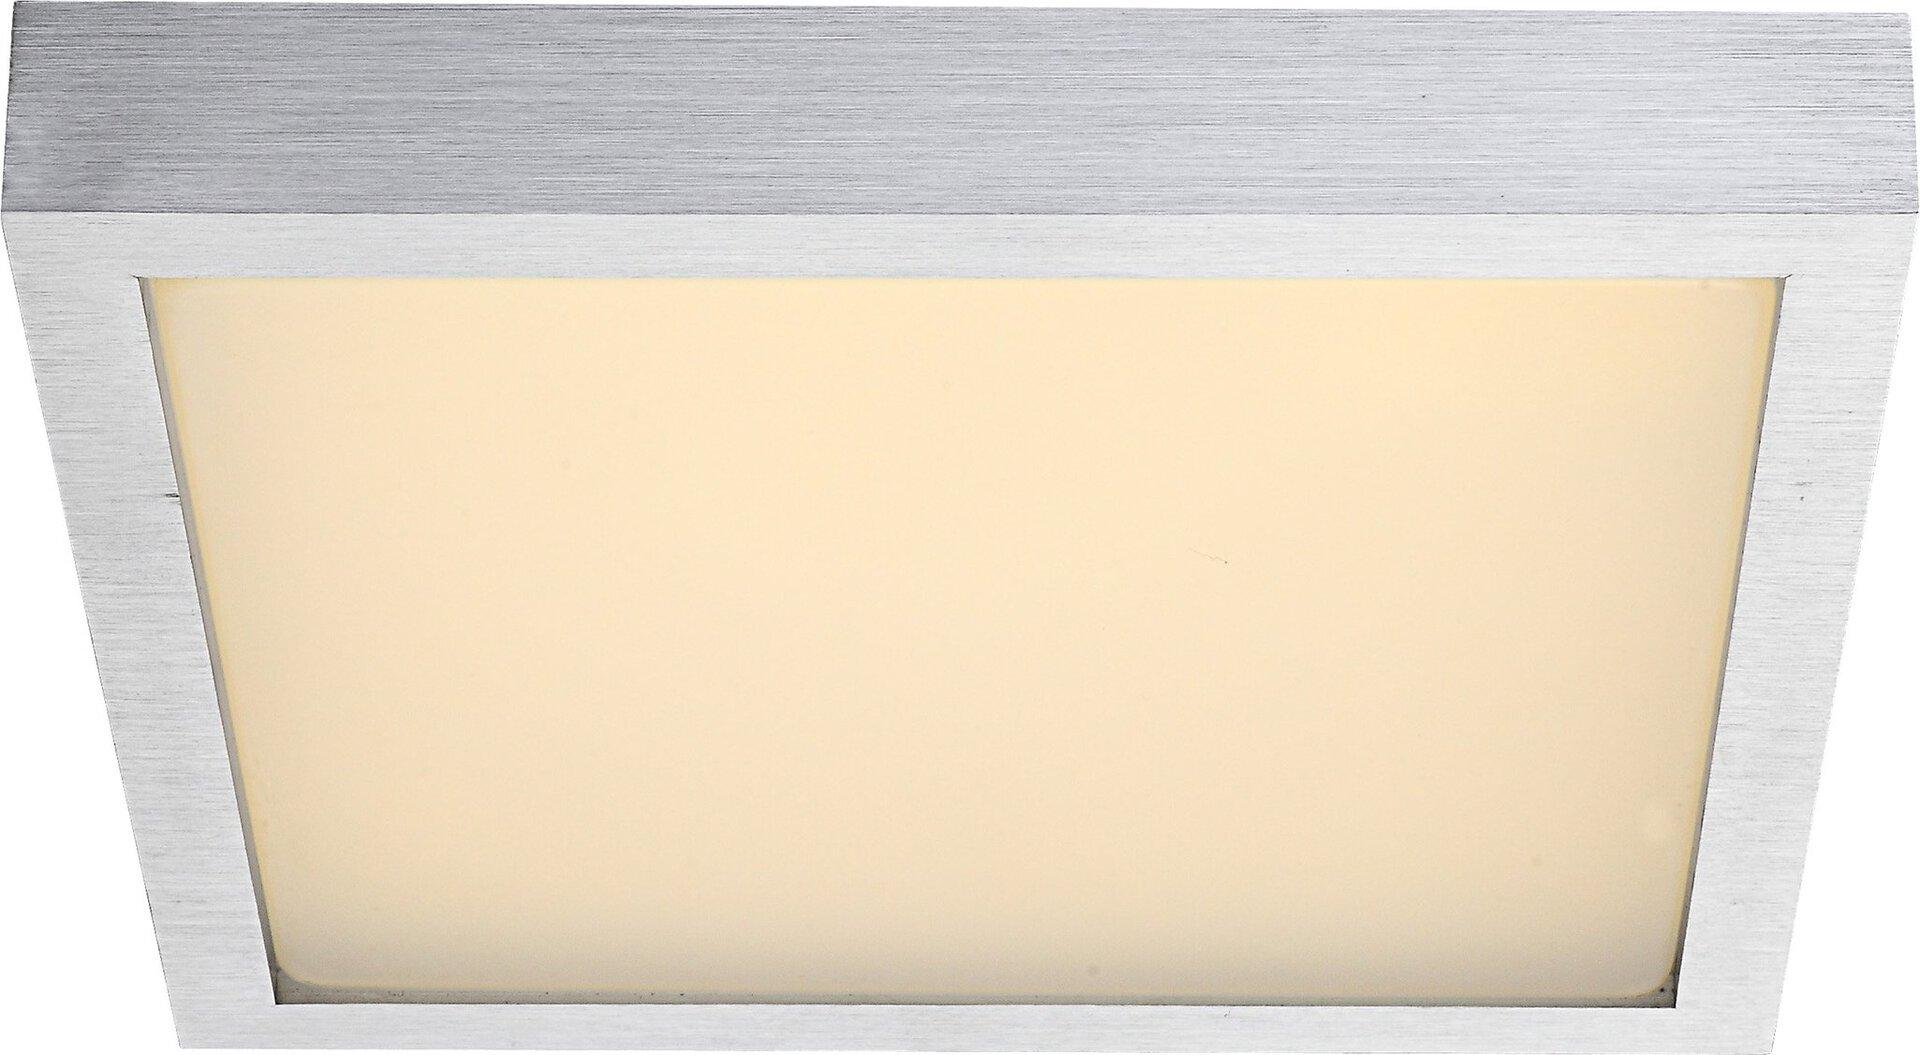 Deckenleuchte TAMINA Globo Metall silber 30 x 8 x 30 cm